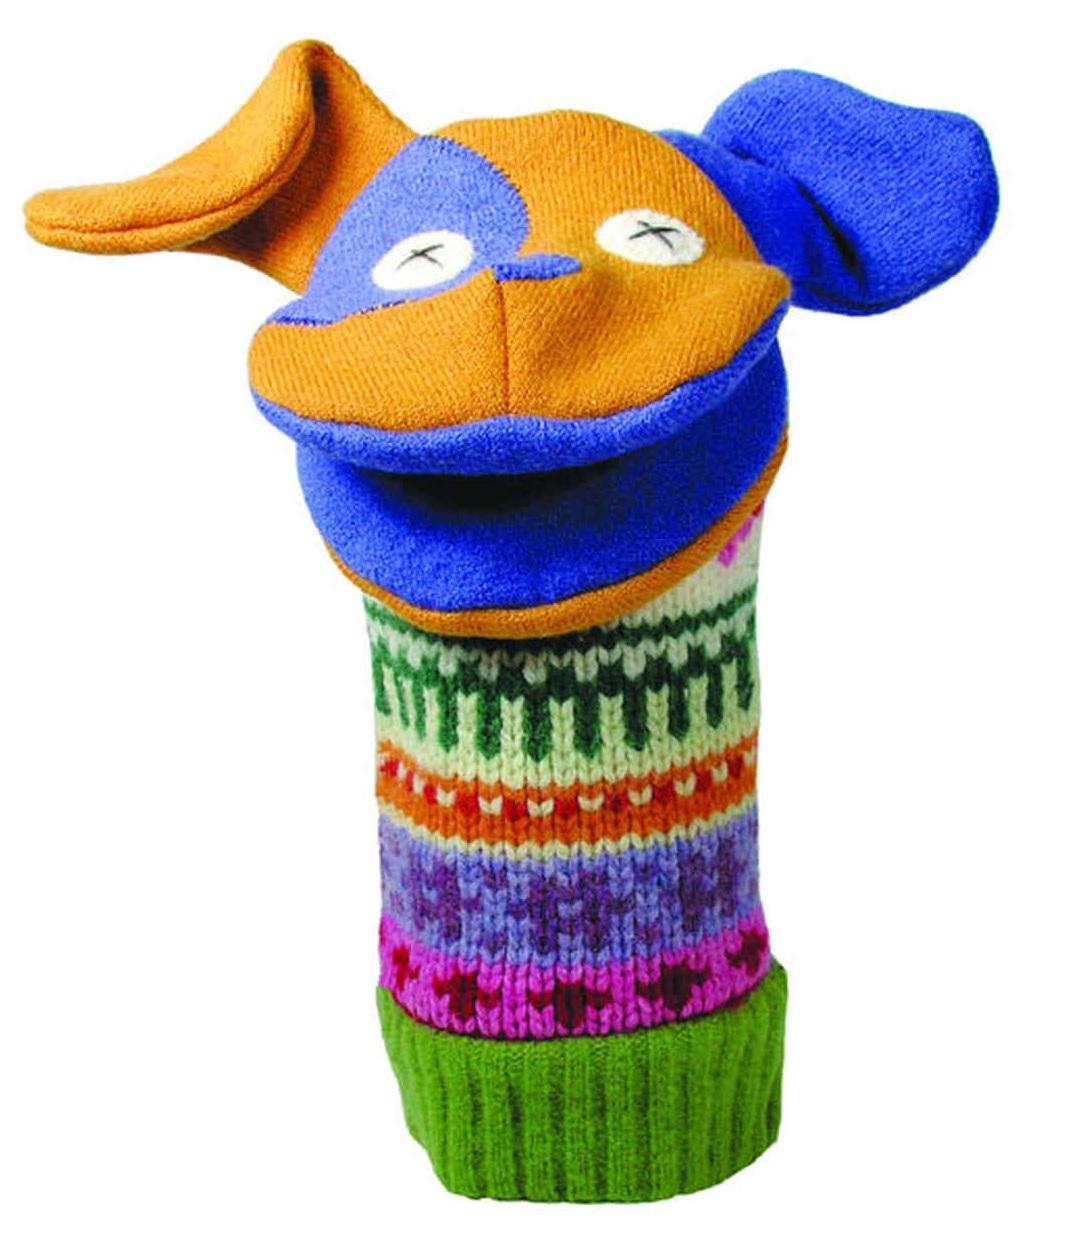 Make Dog Toys Out Of Socks